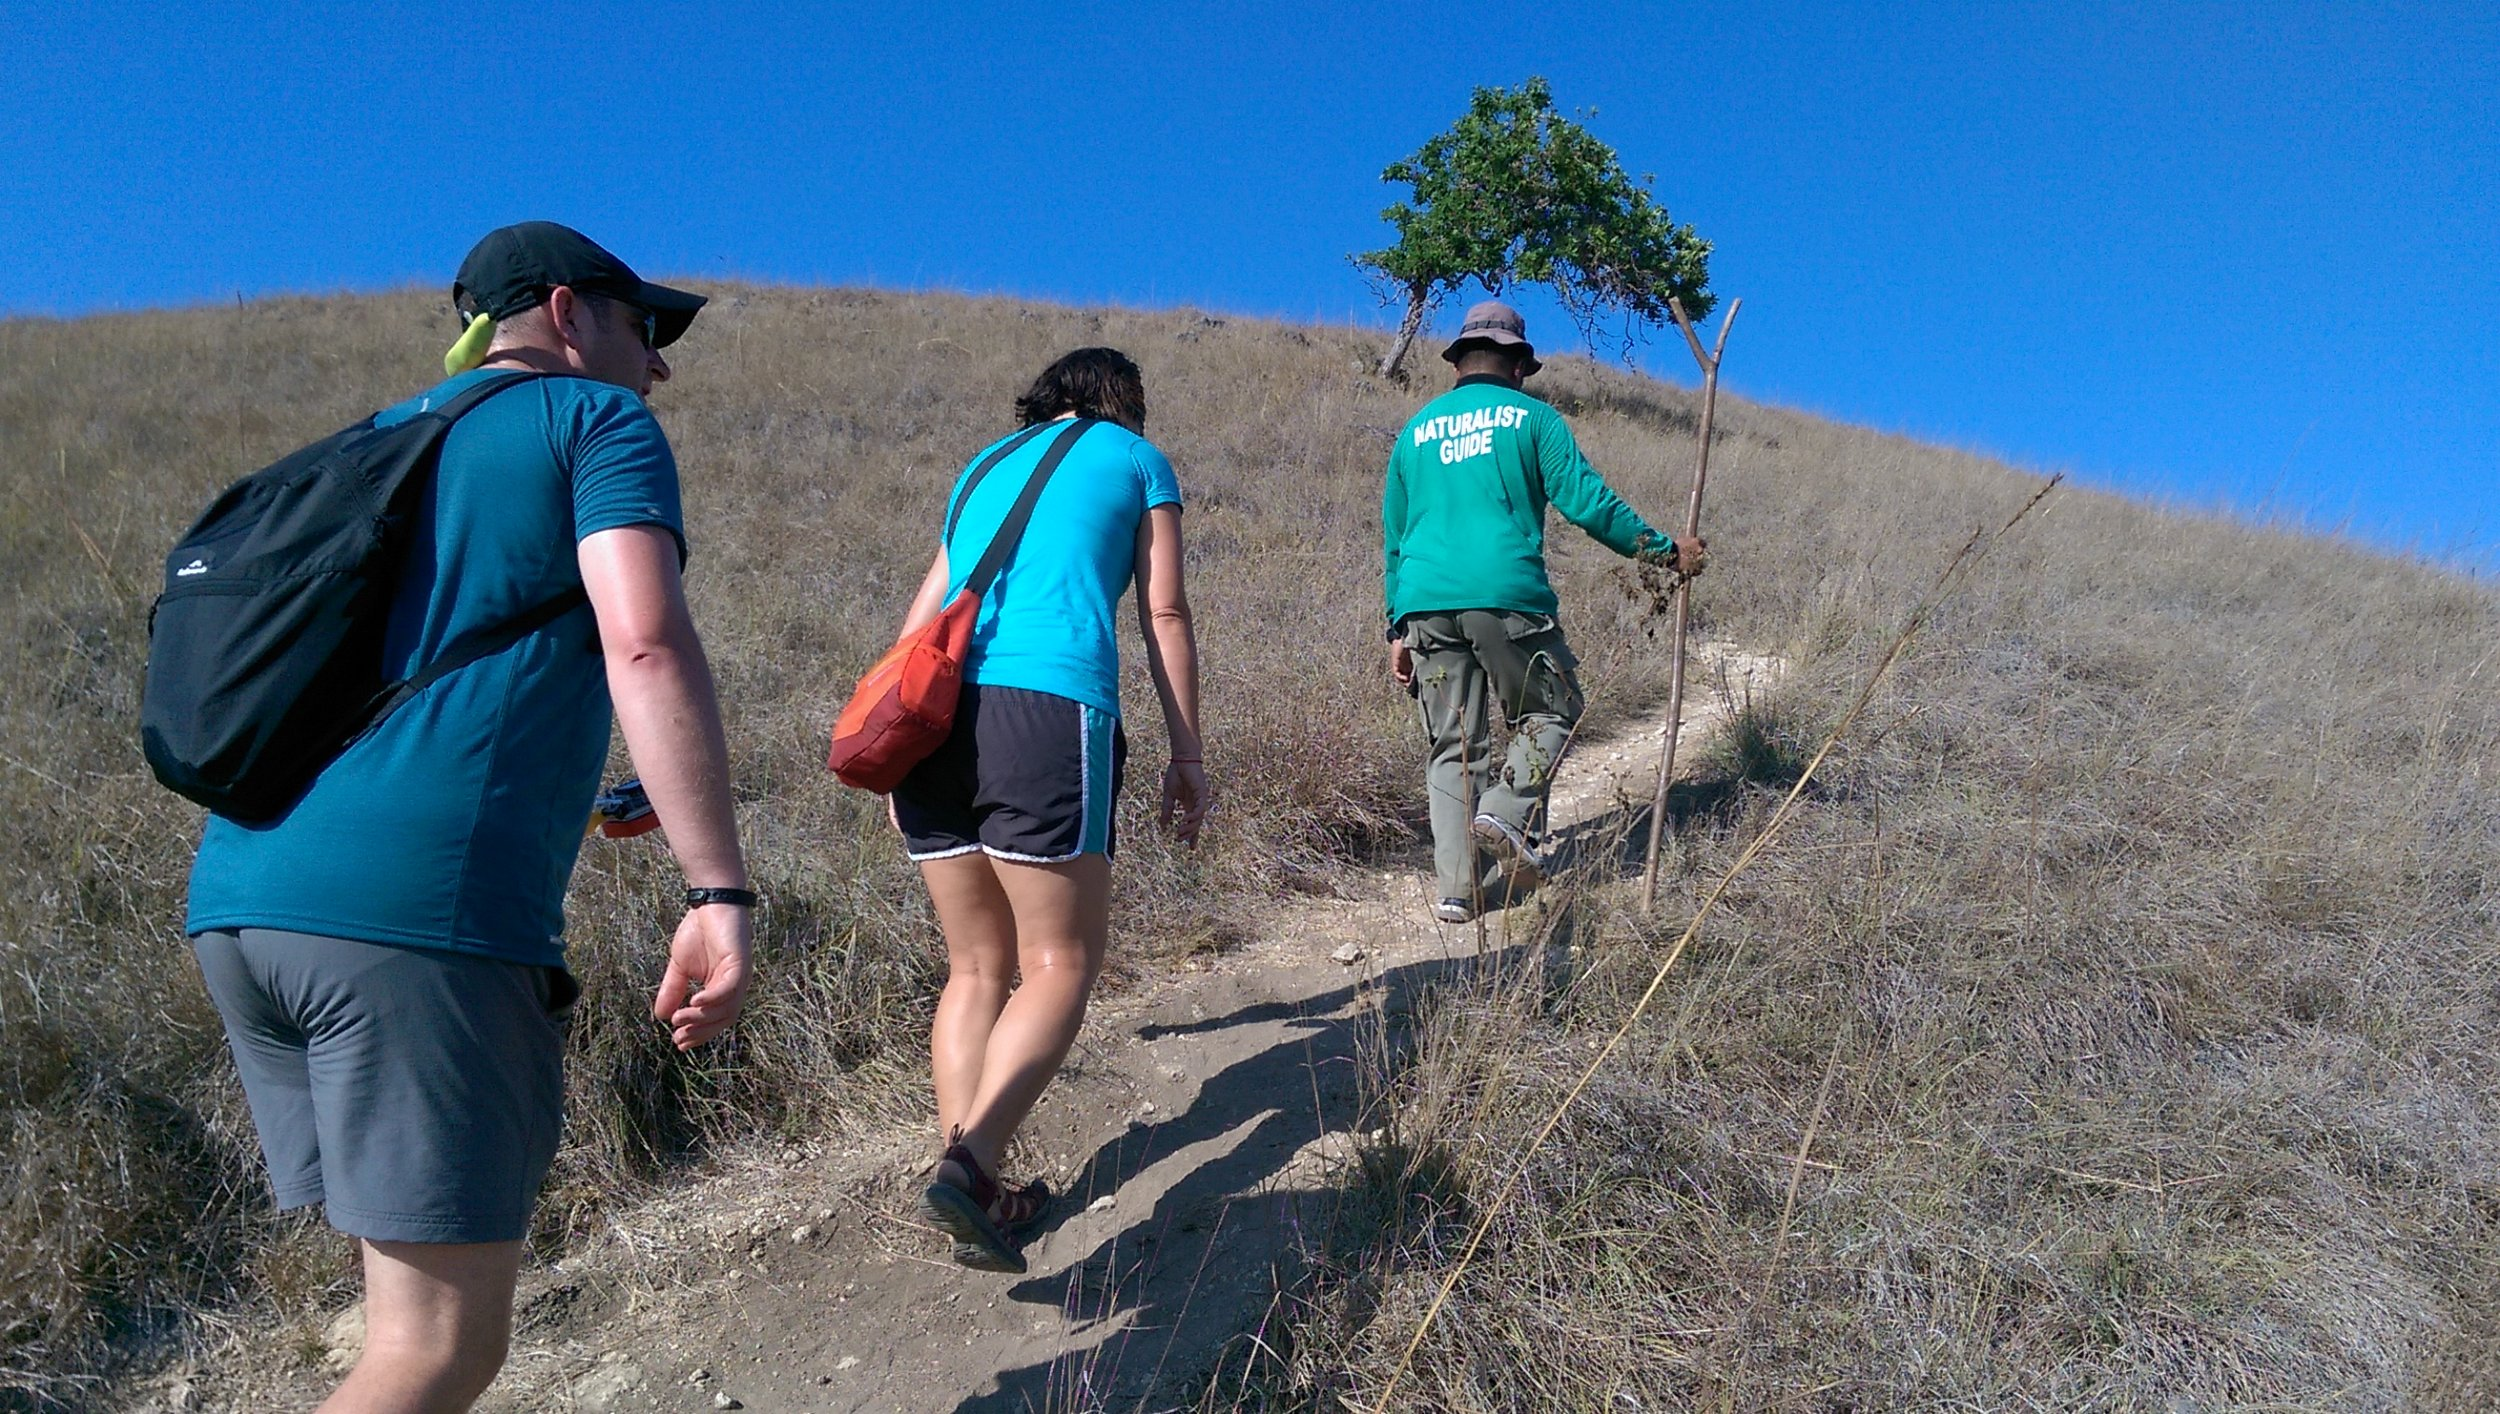 SUP Wilderness Adventures Komodo expedition 2015 (1435).jpg